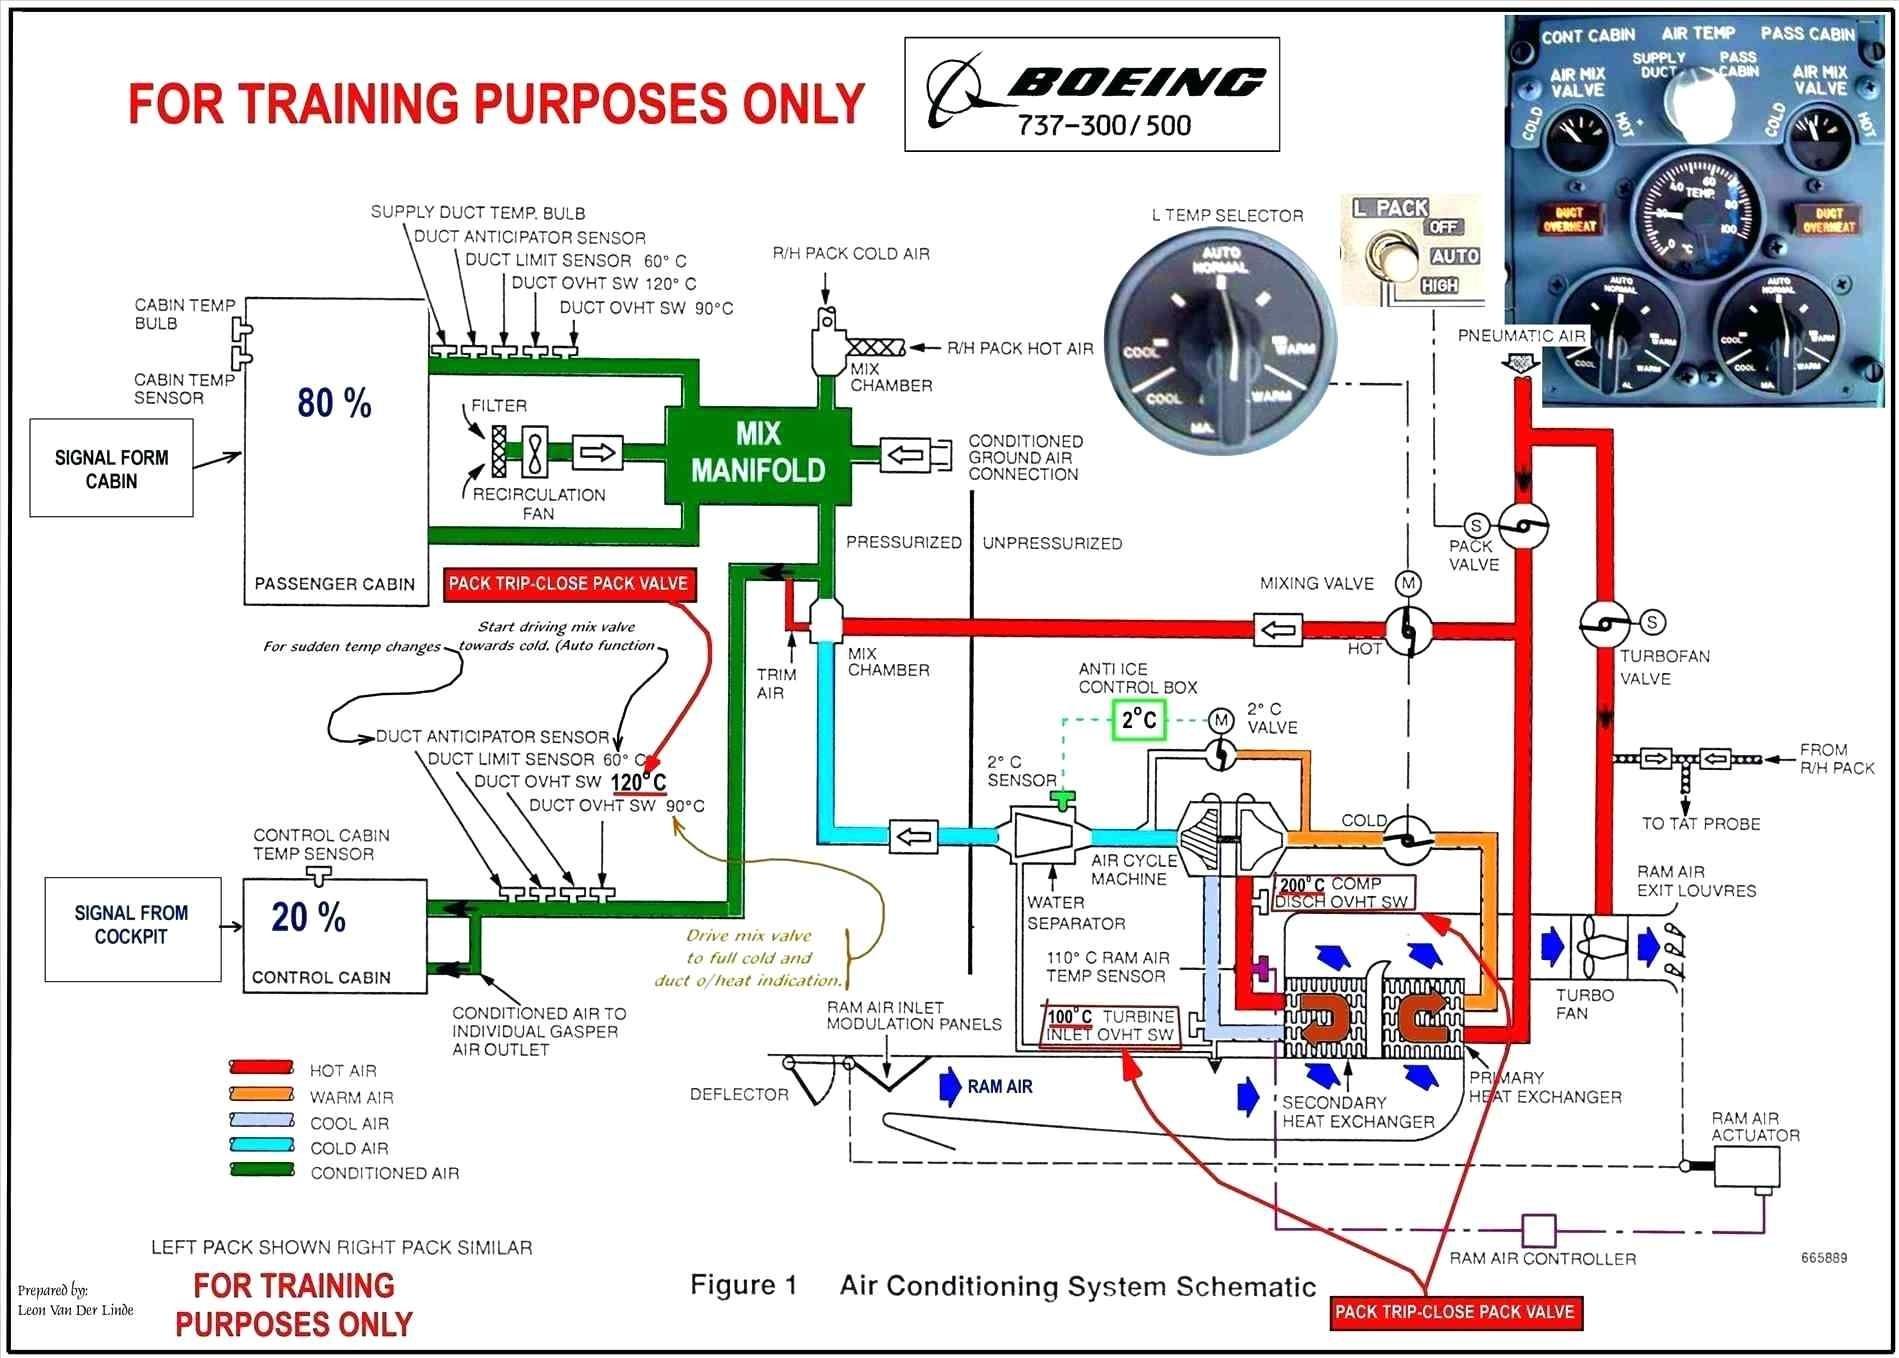 Automobile Ac System Diagram Car Diagram Car Air Conditioning System Wiring Diagram Automotive Of Automobile Ac System Diagram